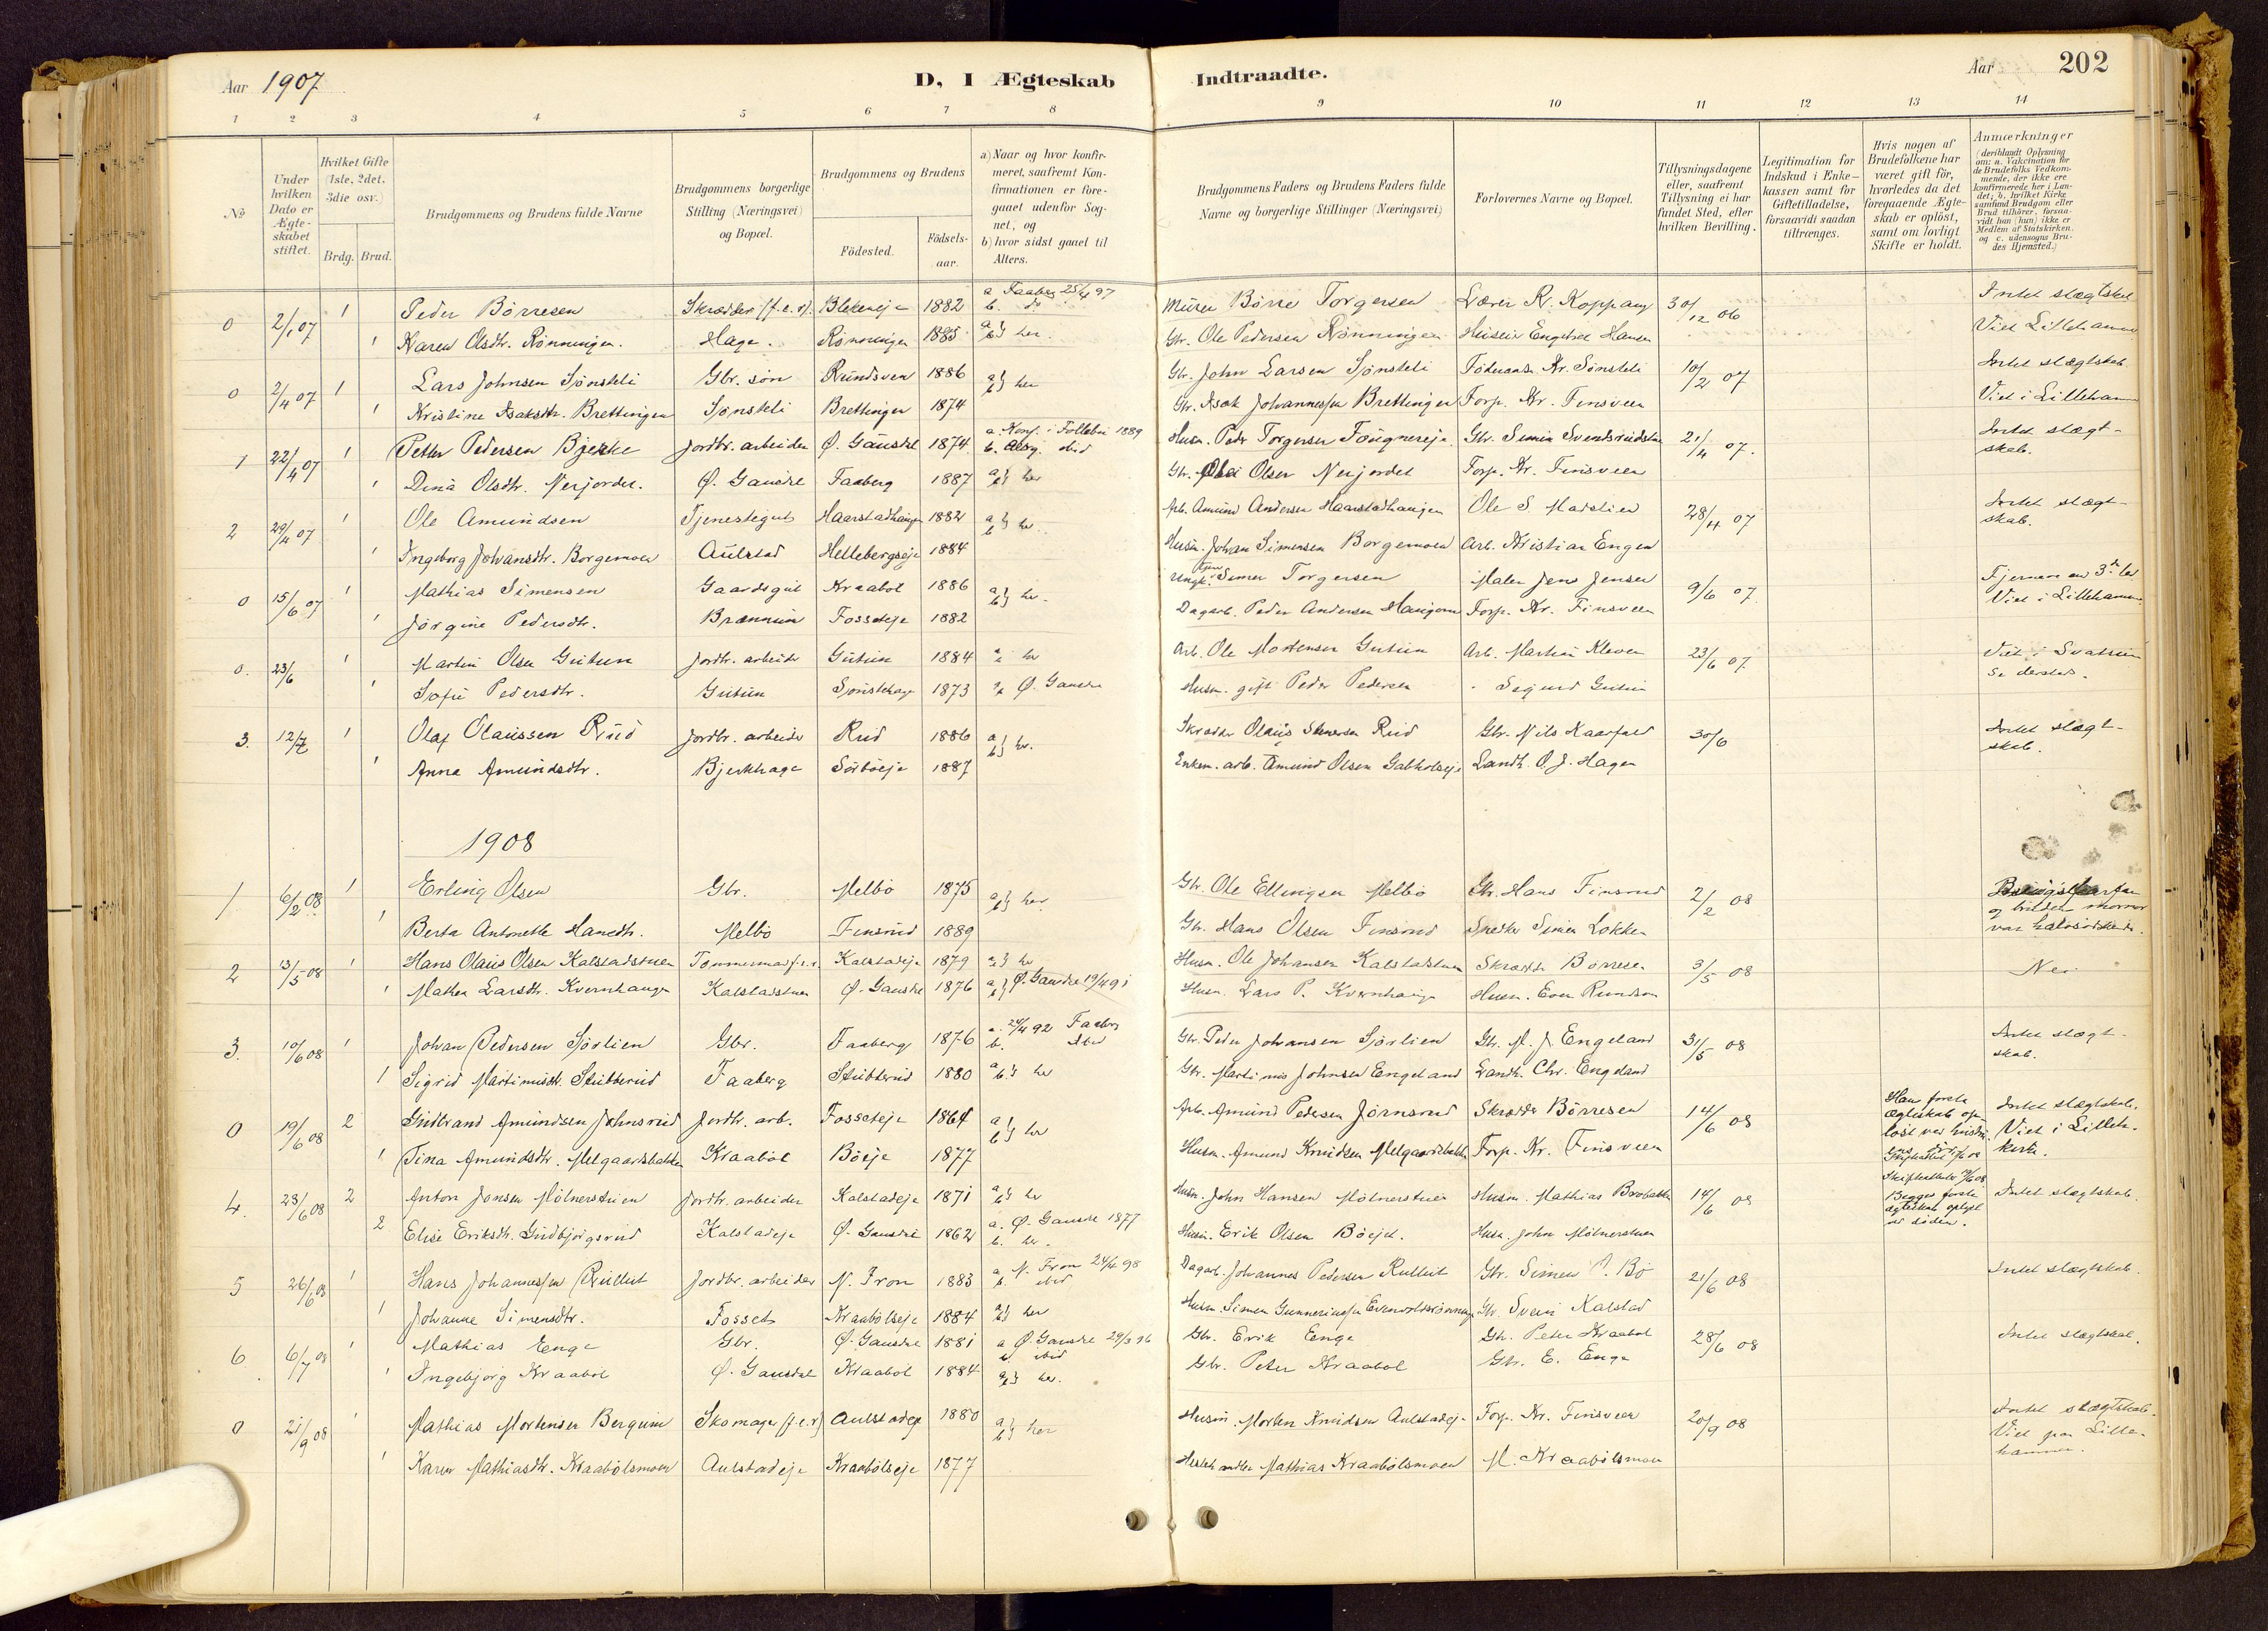 SAH, Vestre Gausdal prestekontor, Ministerialbok nr. 1, 1887-1914, s. 202